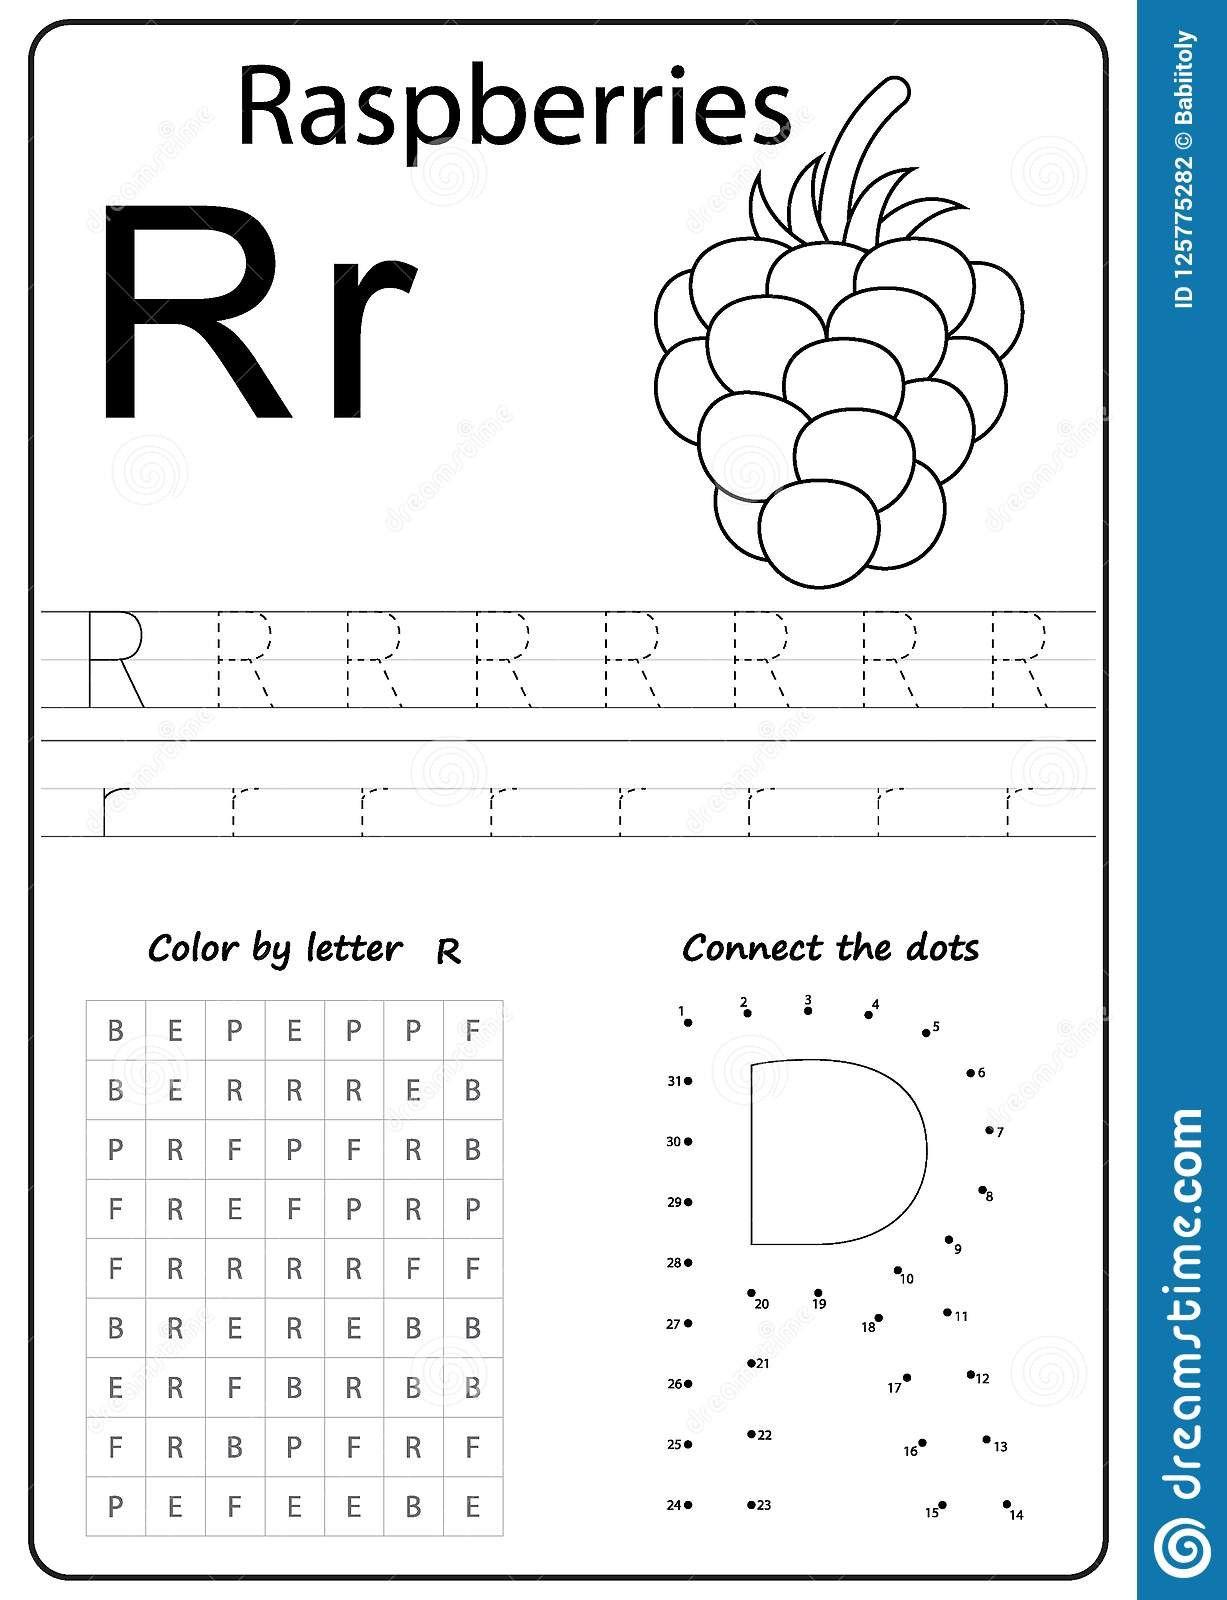 6 Letter R Handwriting Worksheet In 2020 | Letter Worksheets intended for Letter 6 Worksheets